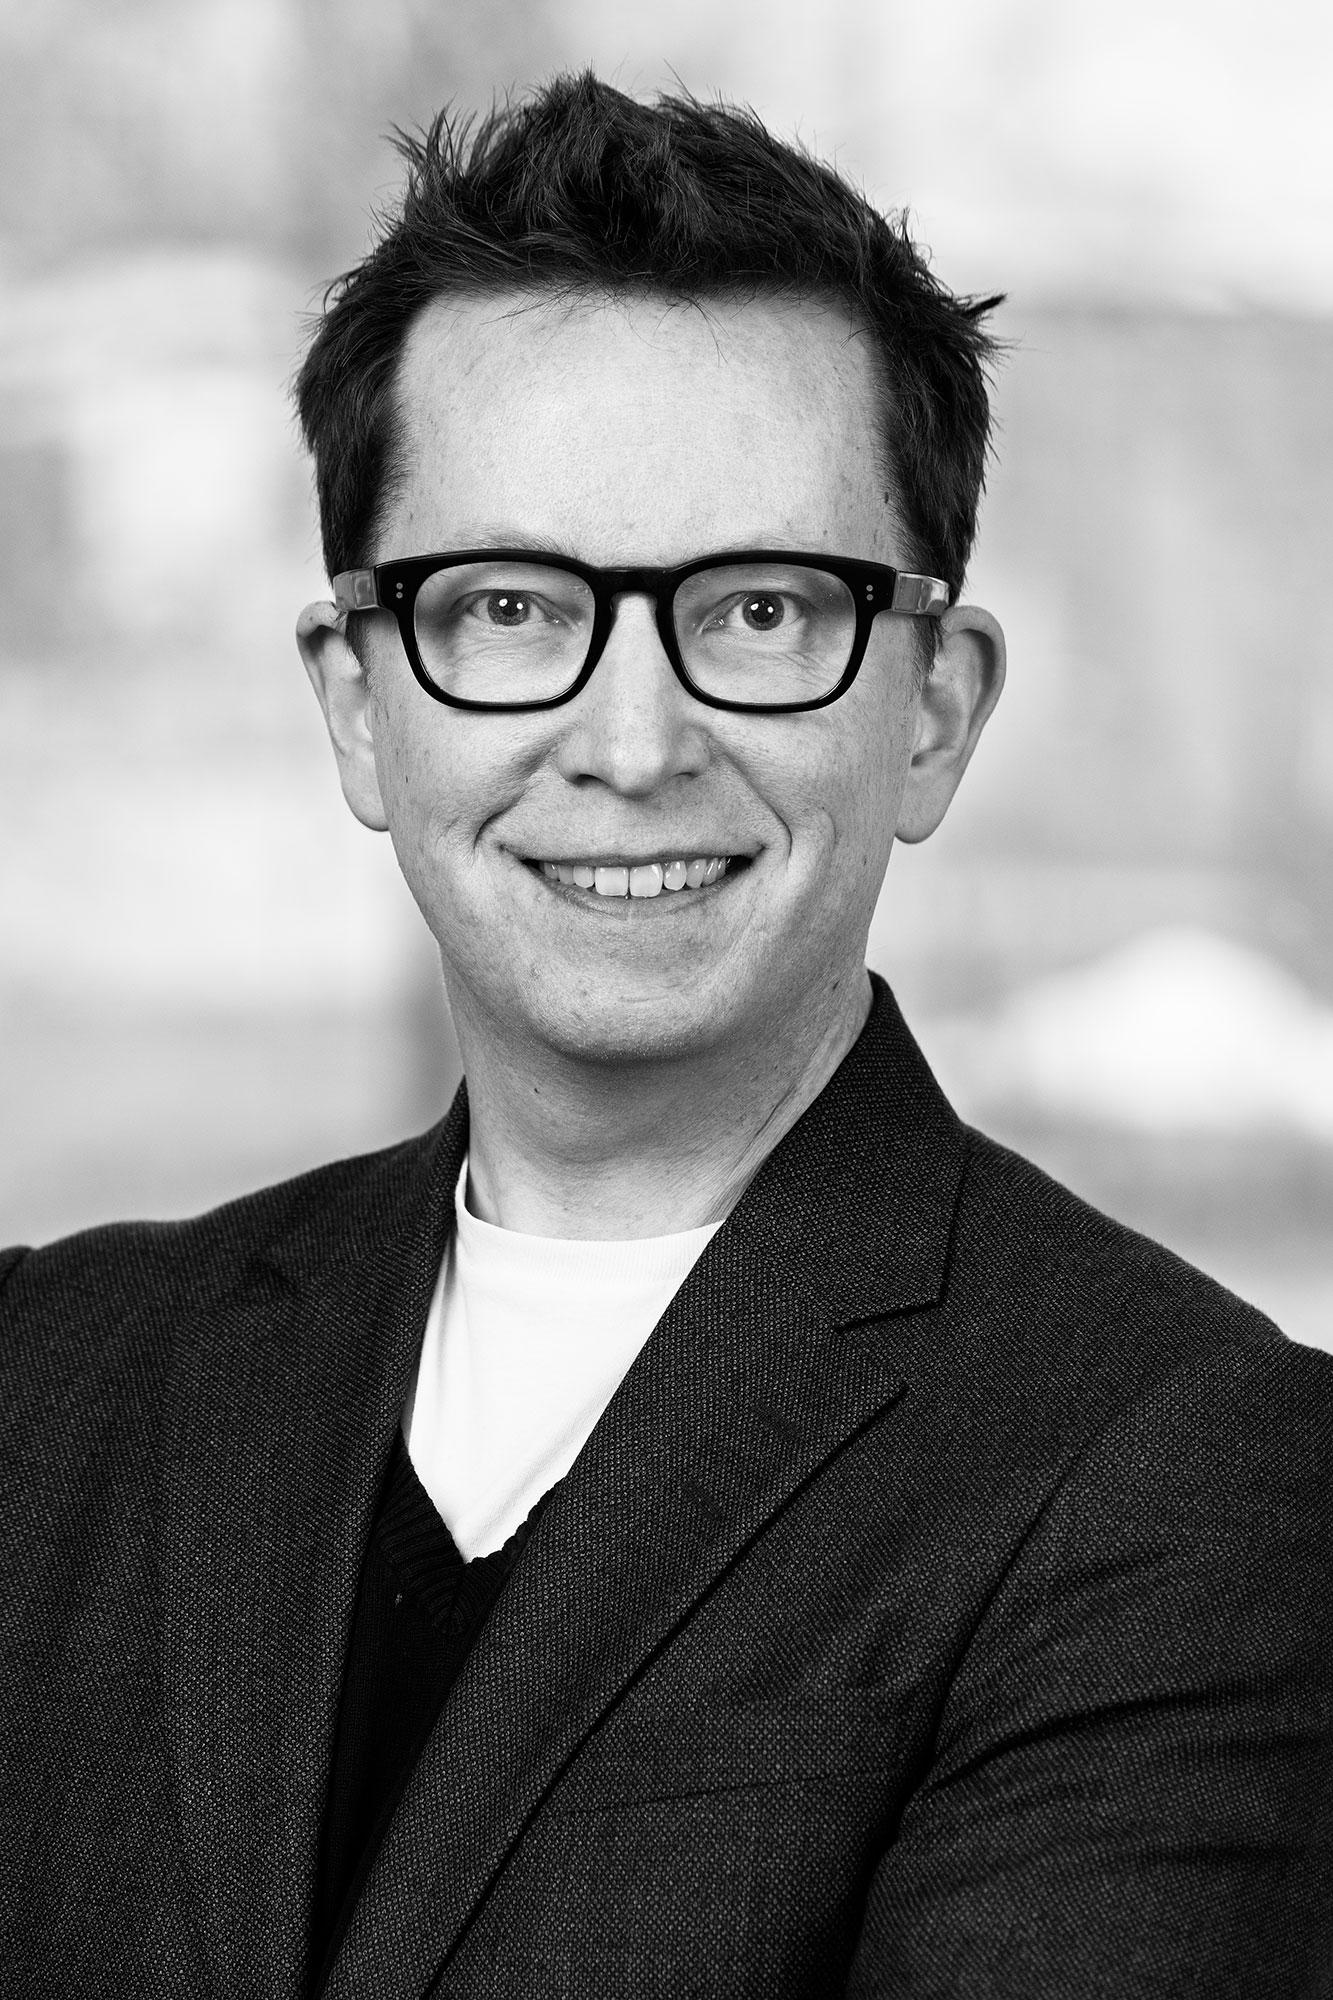 Oscar Ericsson